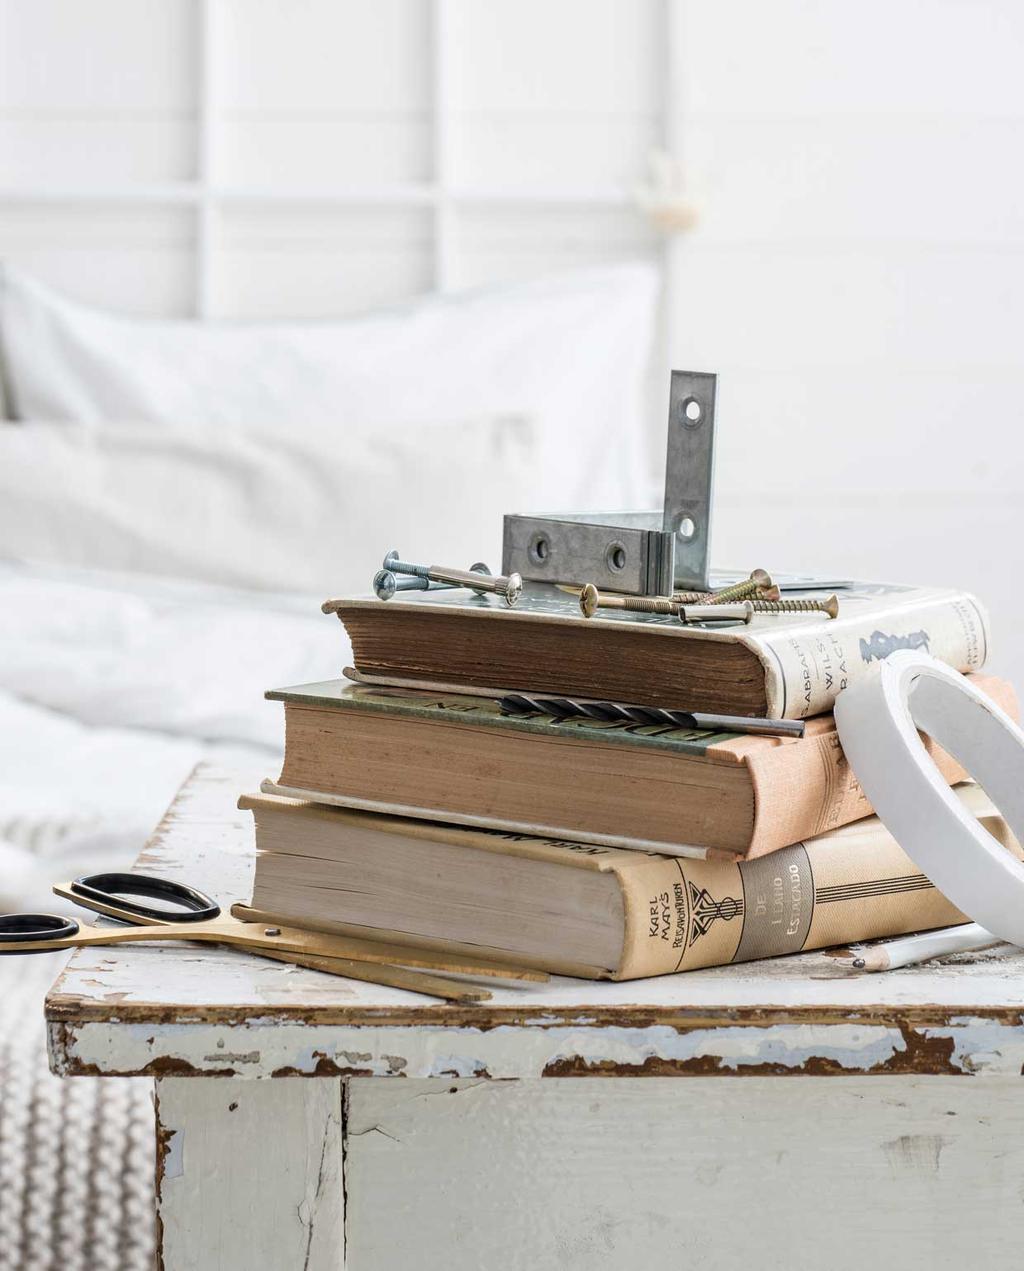 vtwonen 13-2019 | DIY zwevende boekenplank dit heb je nodig